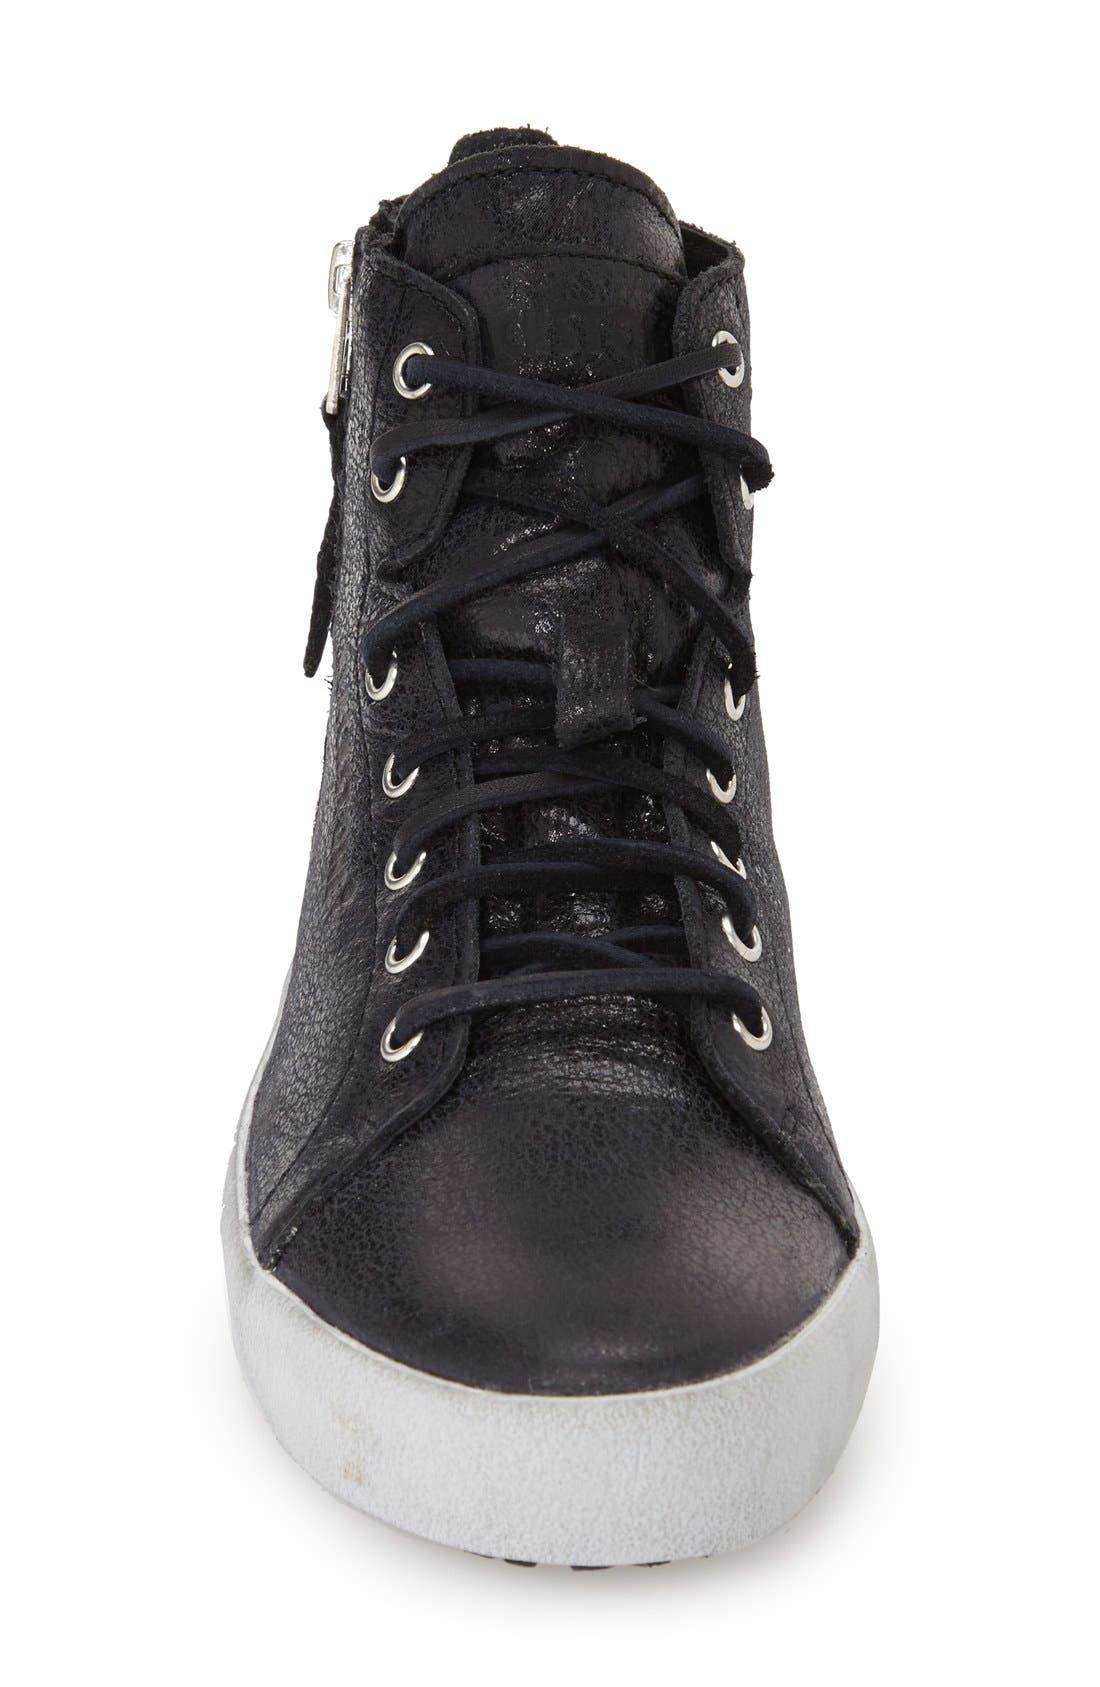 'KL57' High Top Sneaker,                             Alternate thumbnail 3, color,                             Caviar Black Leather